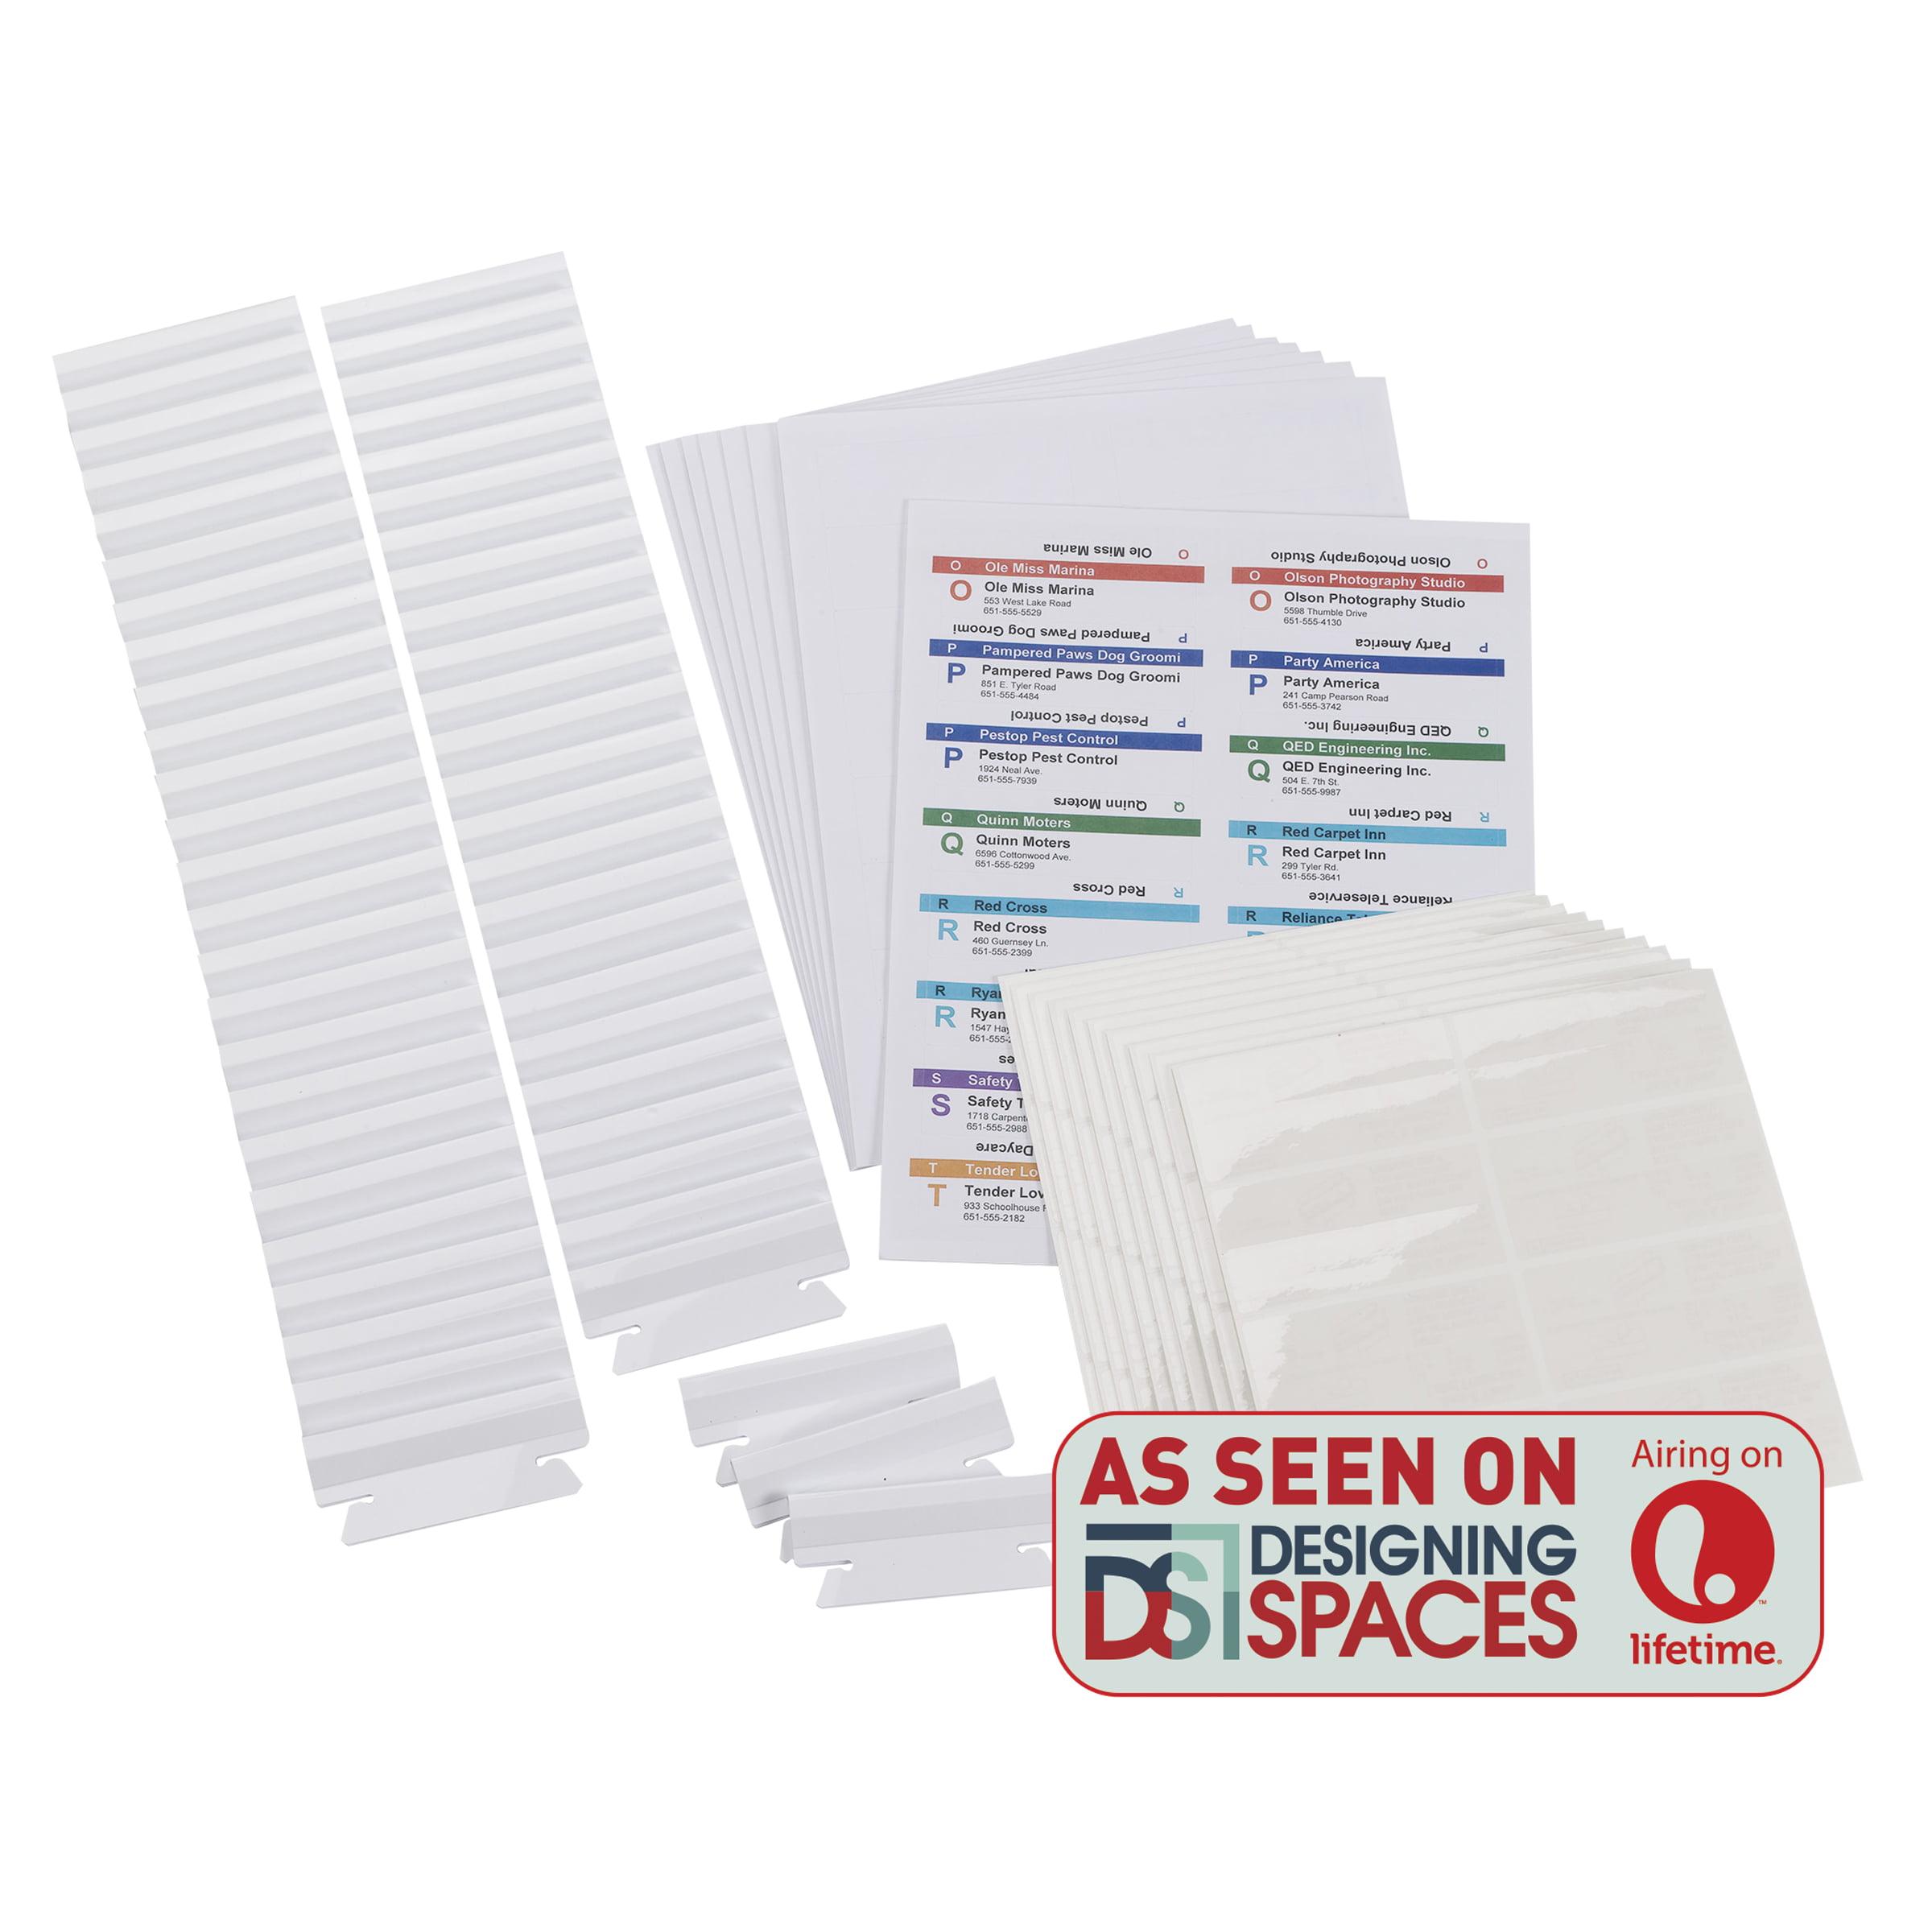 Smead® Viewables® Premium 3D Hanging Folder Tabs and Labels for Inkjet and Laser Printers, bulk pack of 100 (64910)